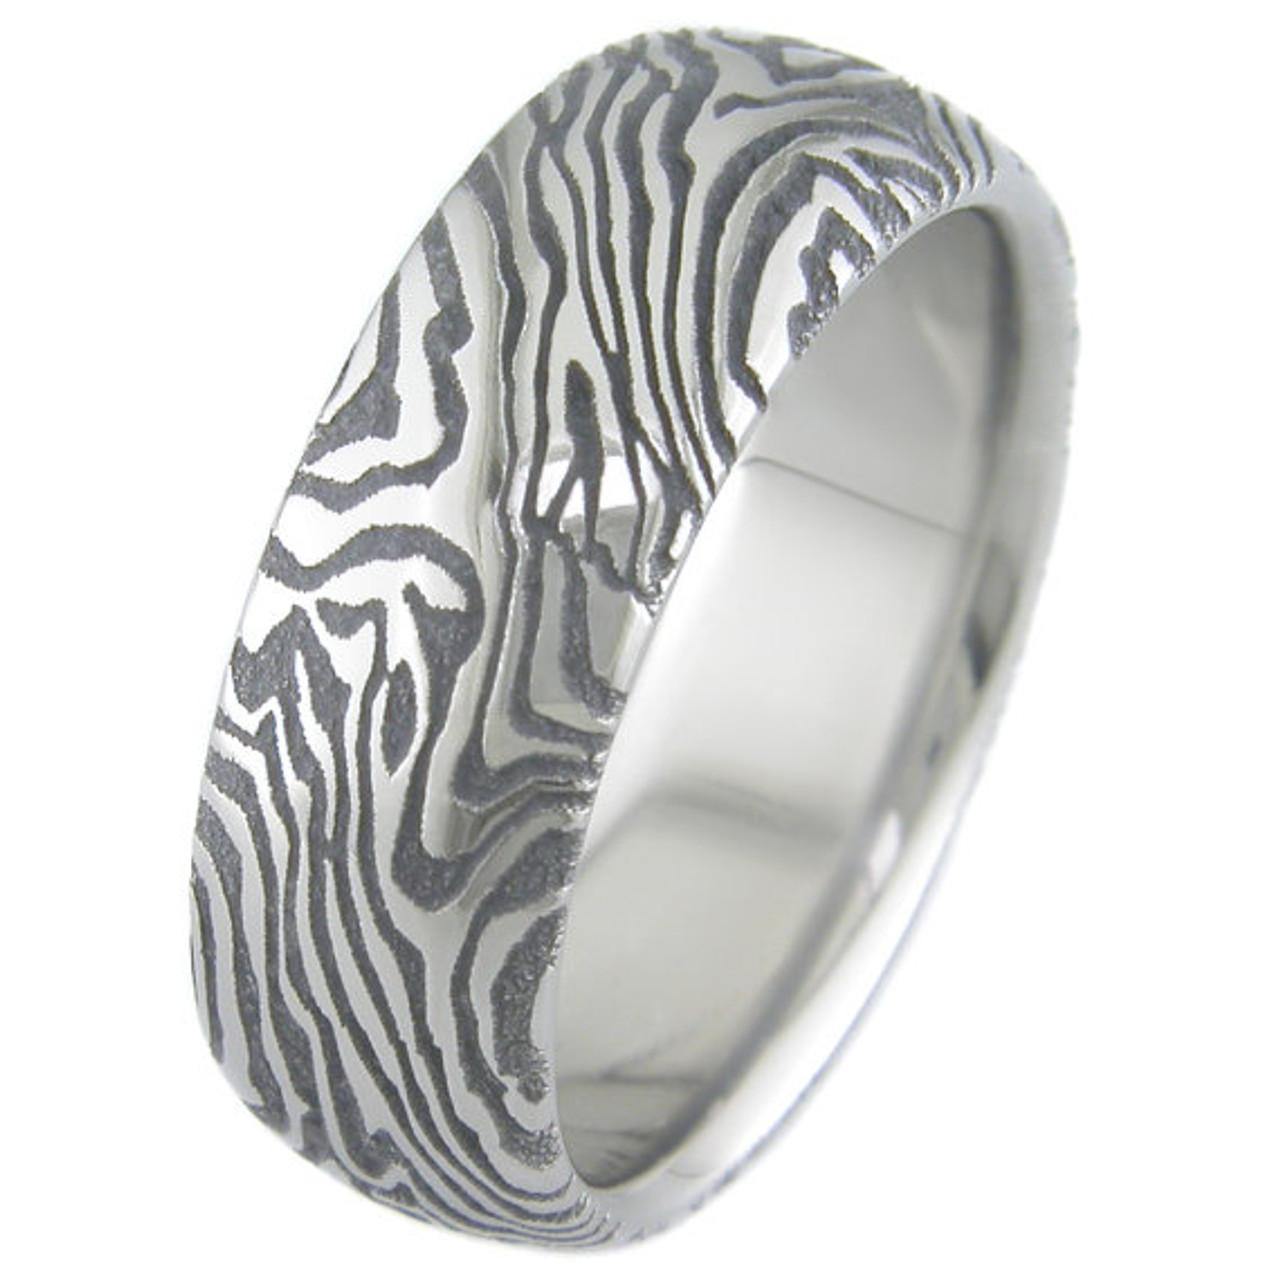 7bbde45bc Mokume-Style Laser Engraved Titanium Ring by Titanium-Buzz